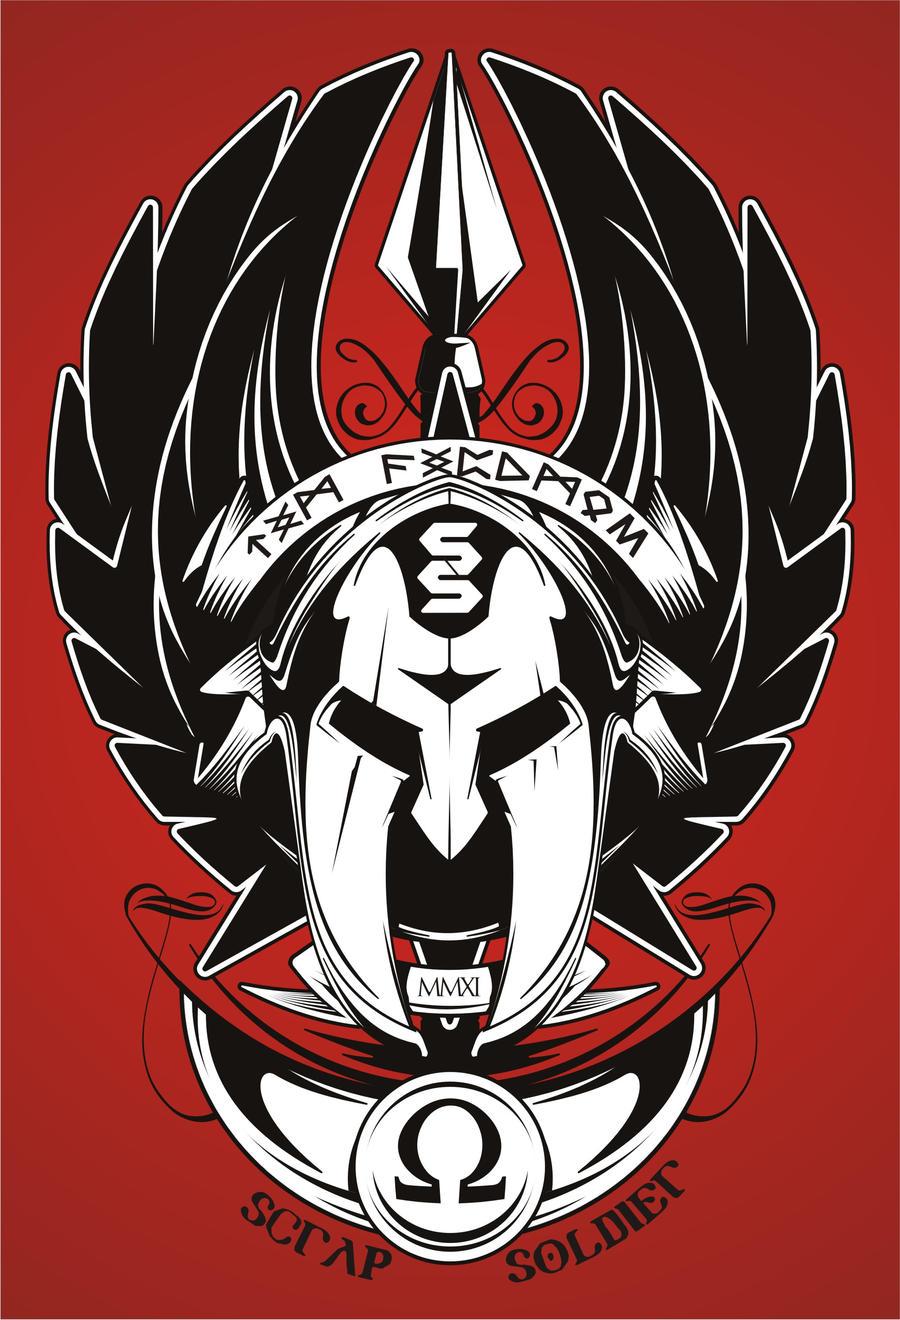 Scrap Soldier Gladiator by BurningEyeStudios